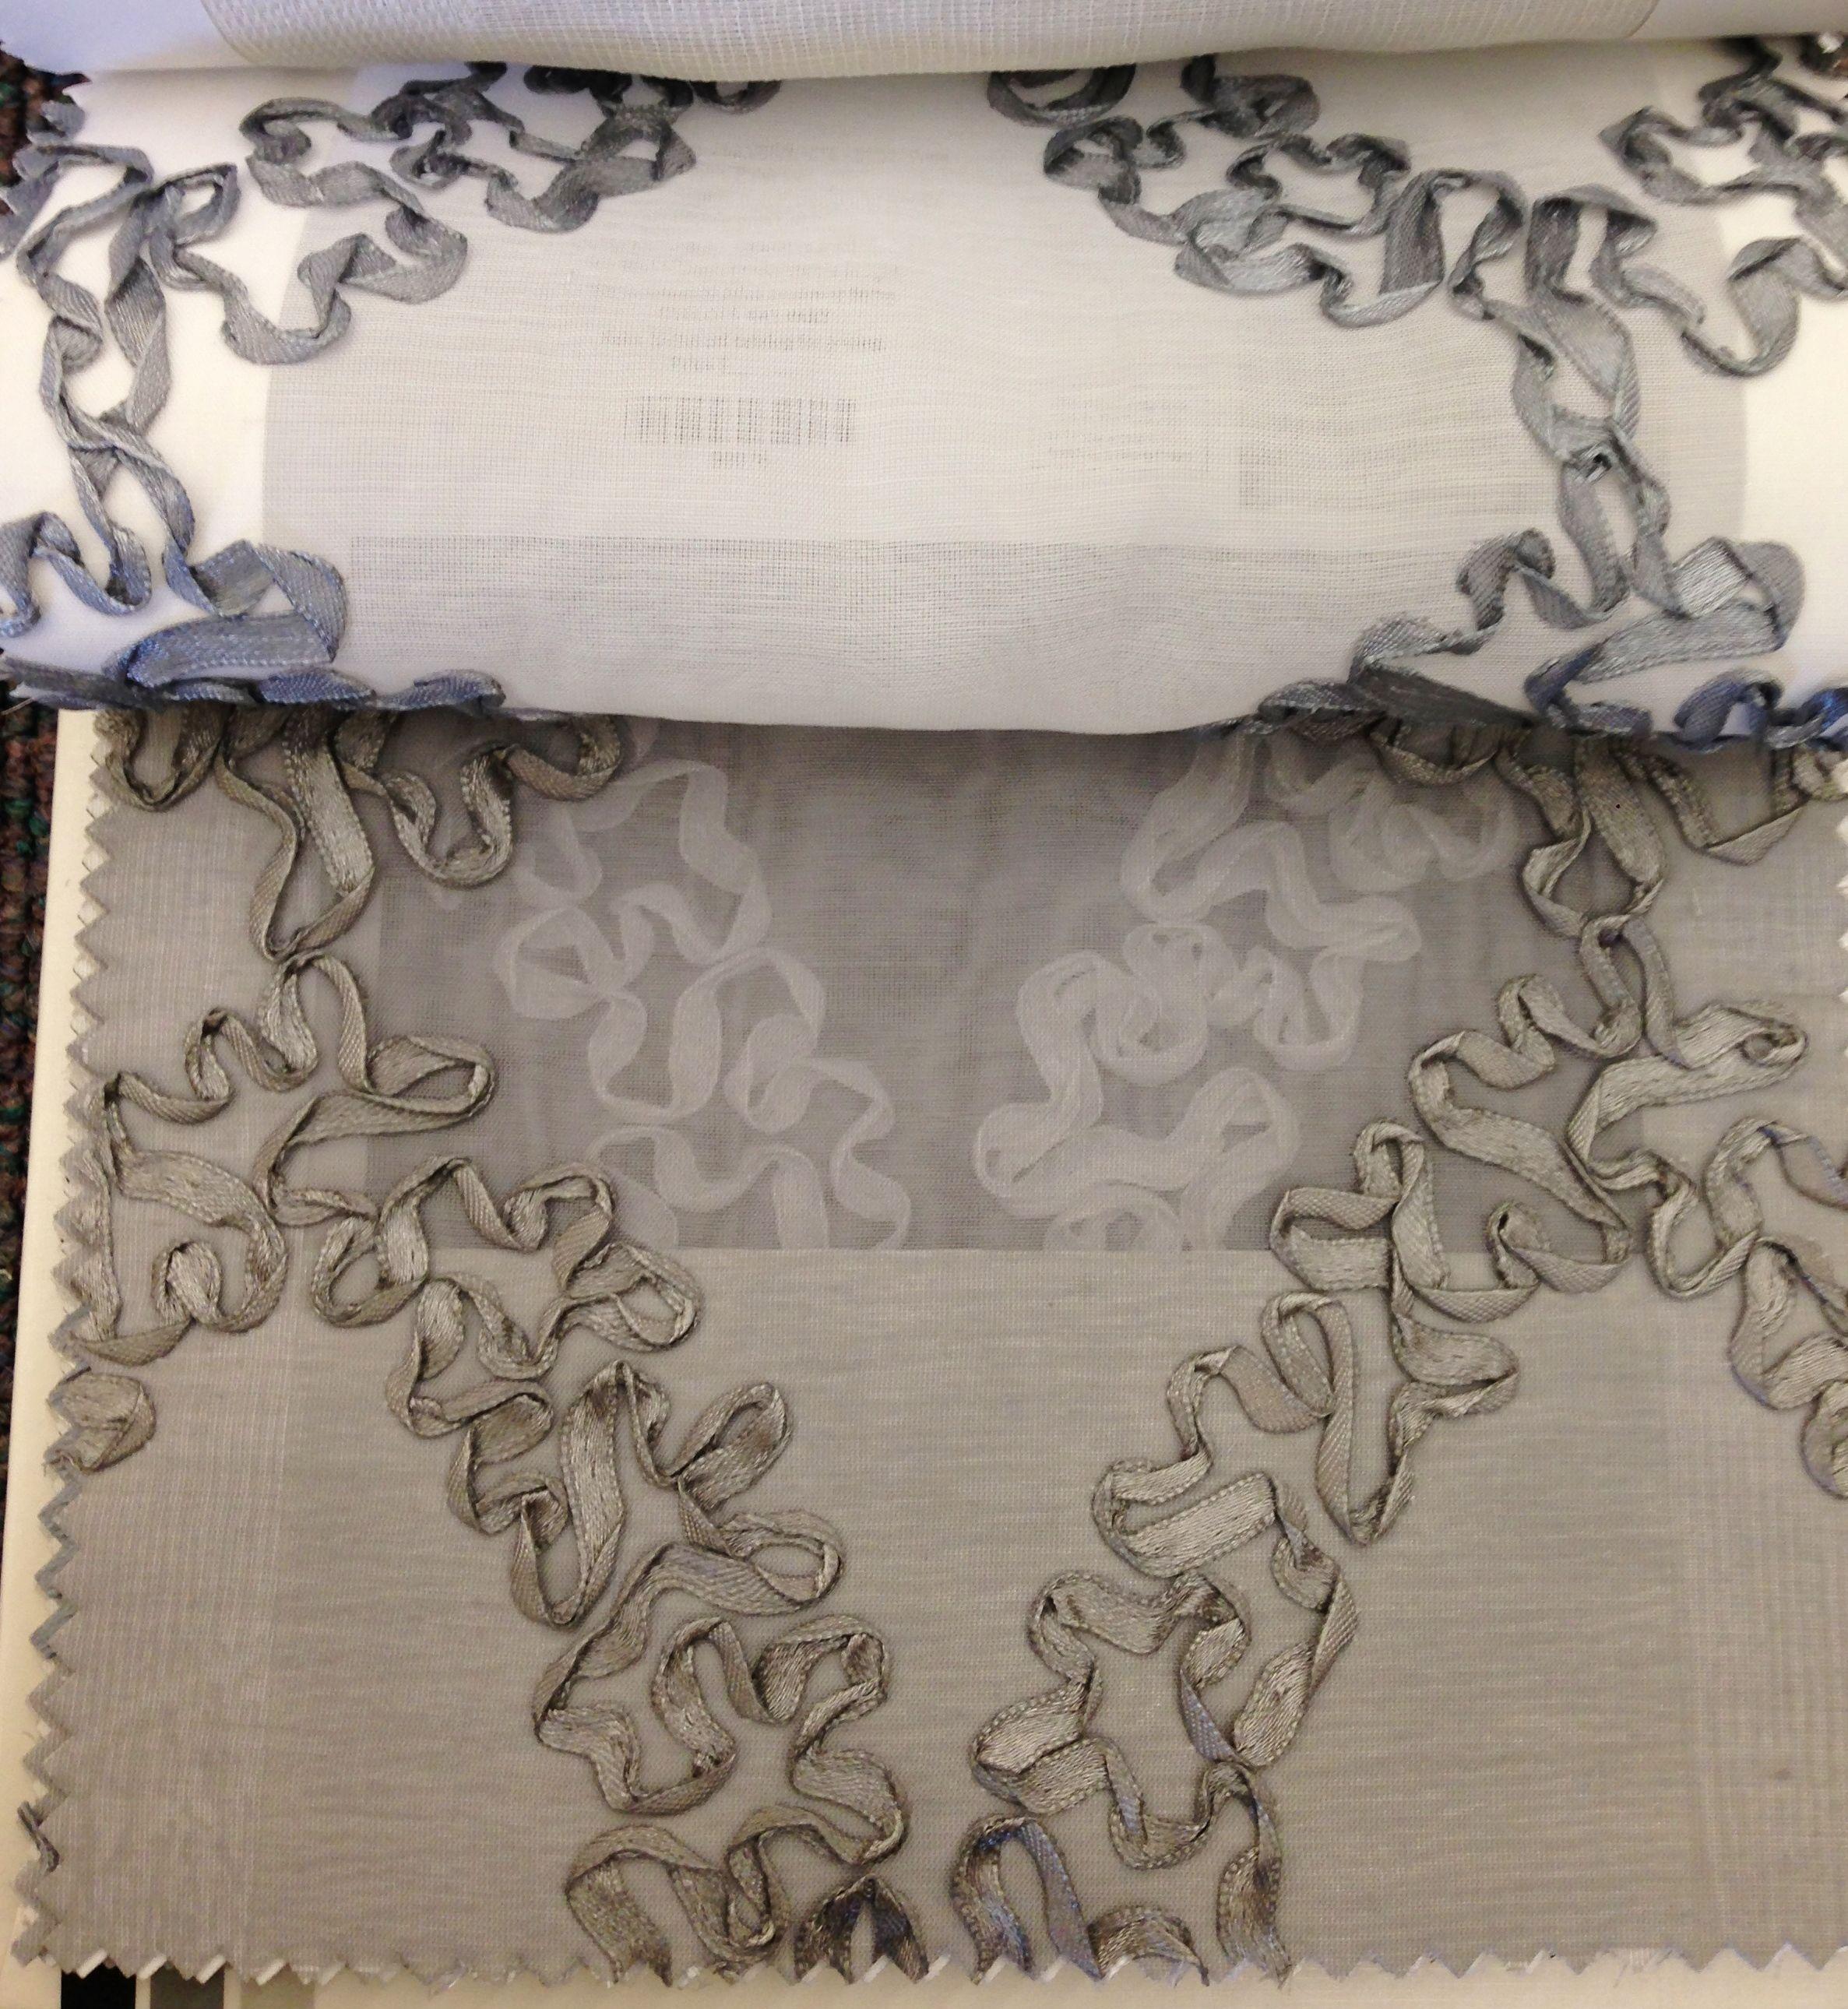 Twist & Shout, colors Silver/white, & Grey.